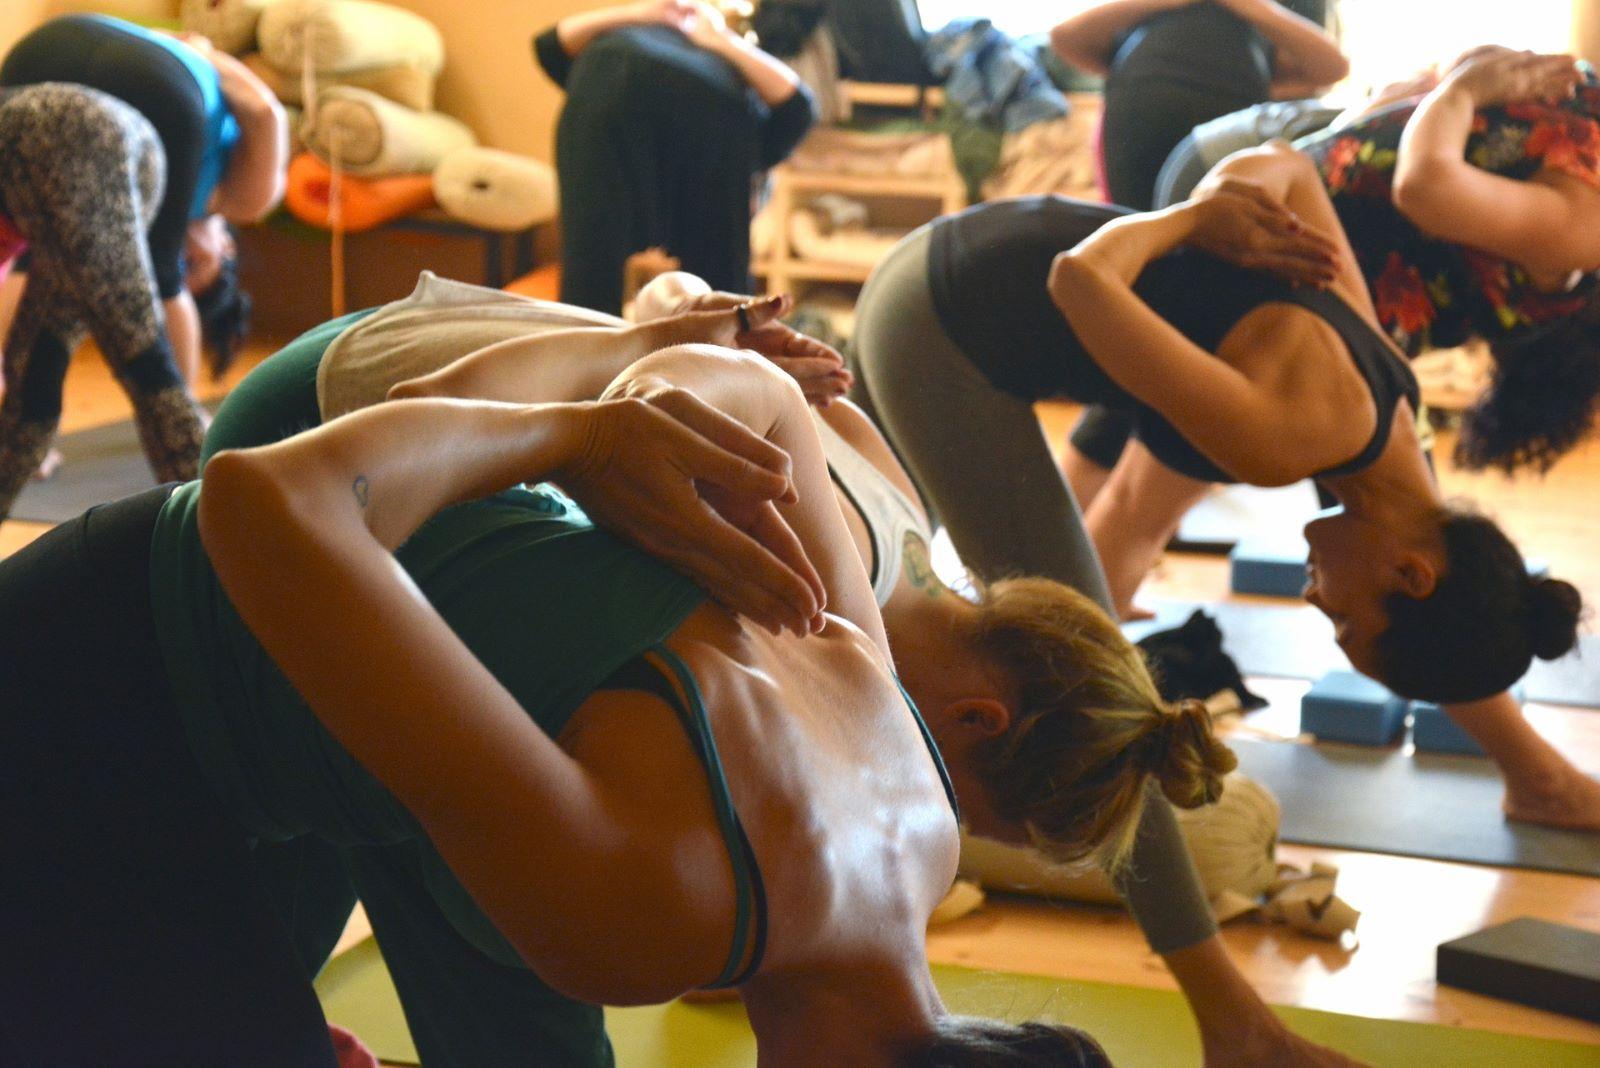 cours de buti yoga